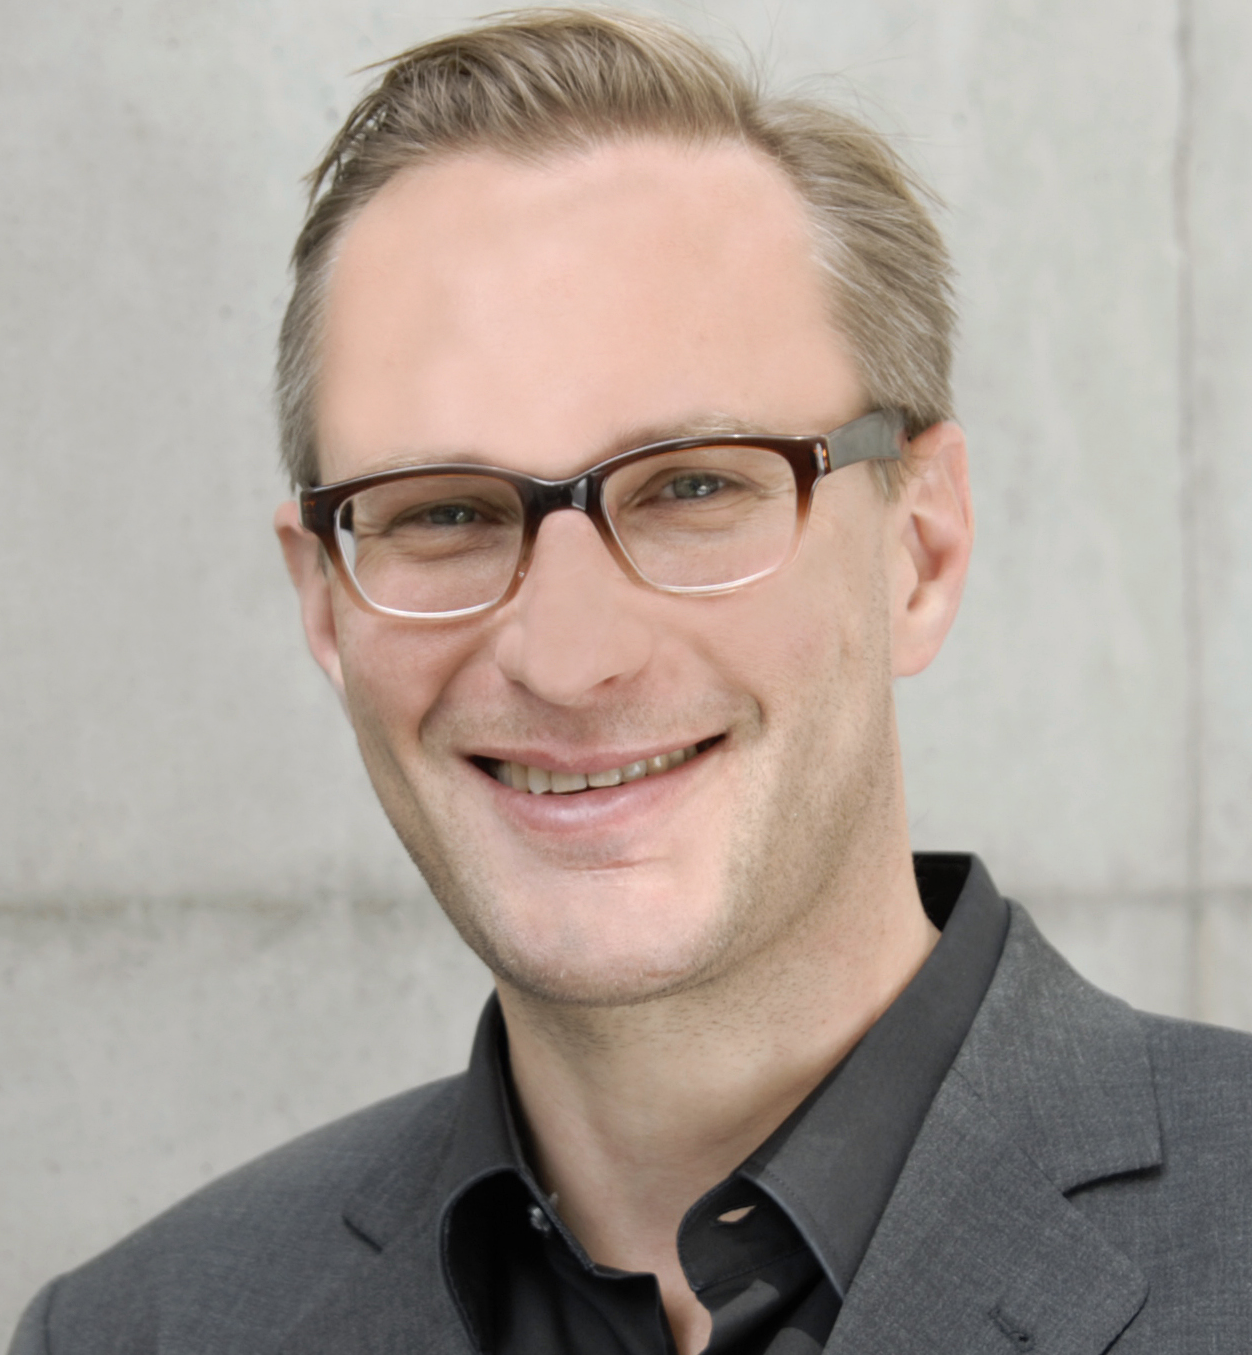 Wolfgang Banneitz